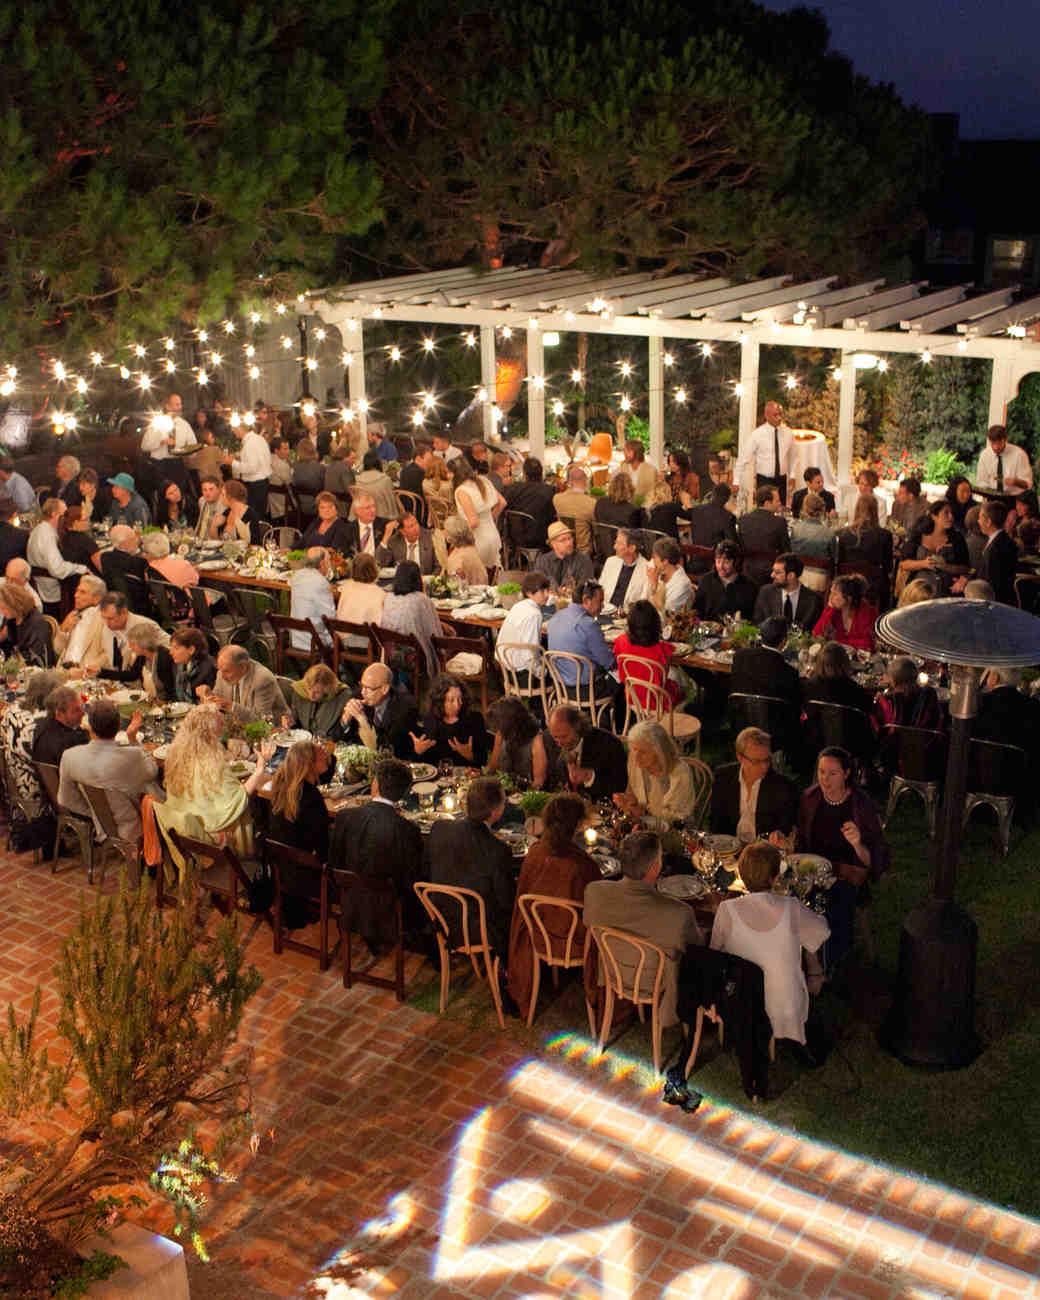 Outdoor wedding lighting decoration ideas Reception Decorations Outdoor Wedding Lighting Ideas From Real Celebrations Martha Stewart Weddings Martha Stewart Weddings Outdoor Wedding Lighting Ideas From Real Celebrations Martha